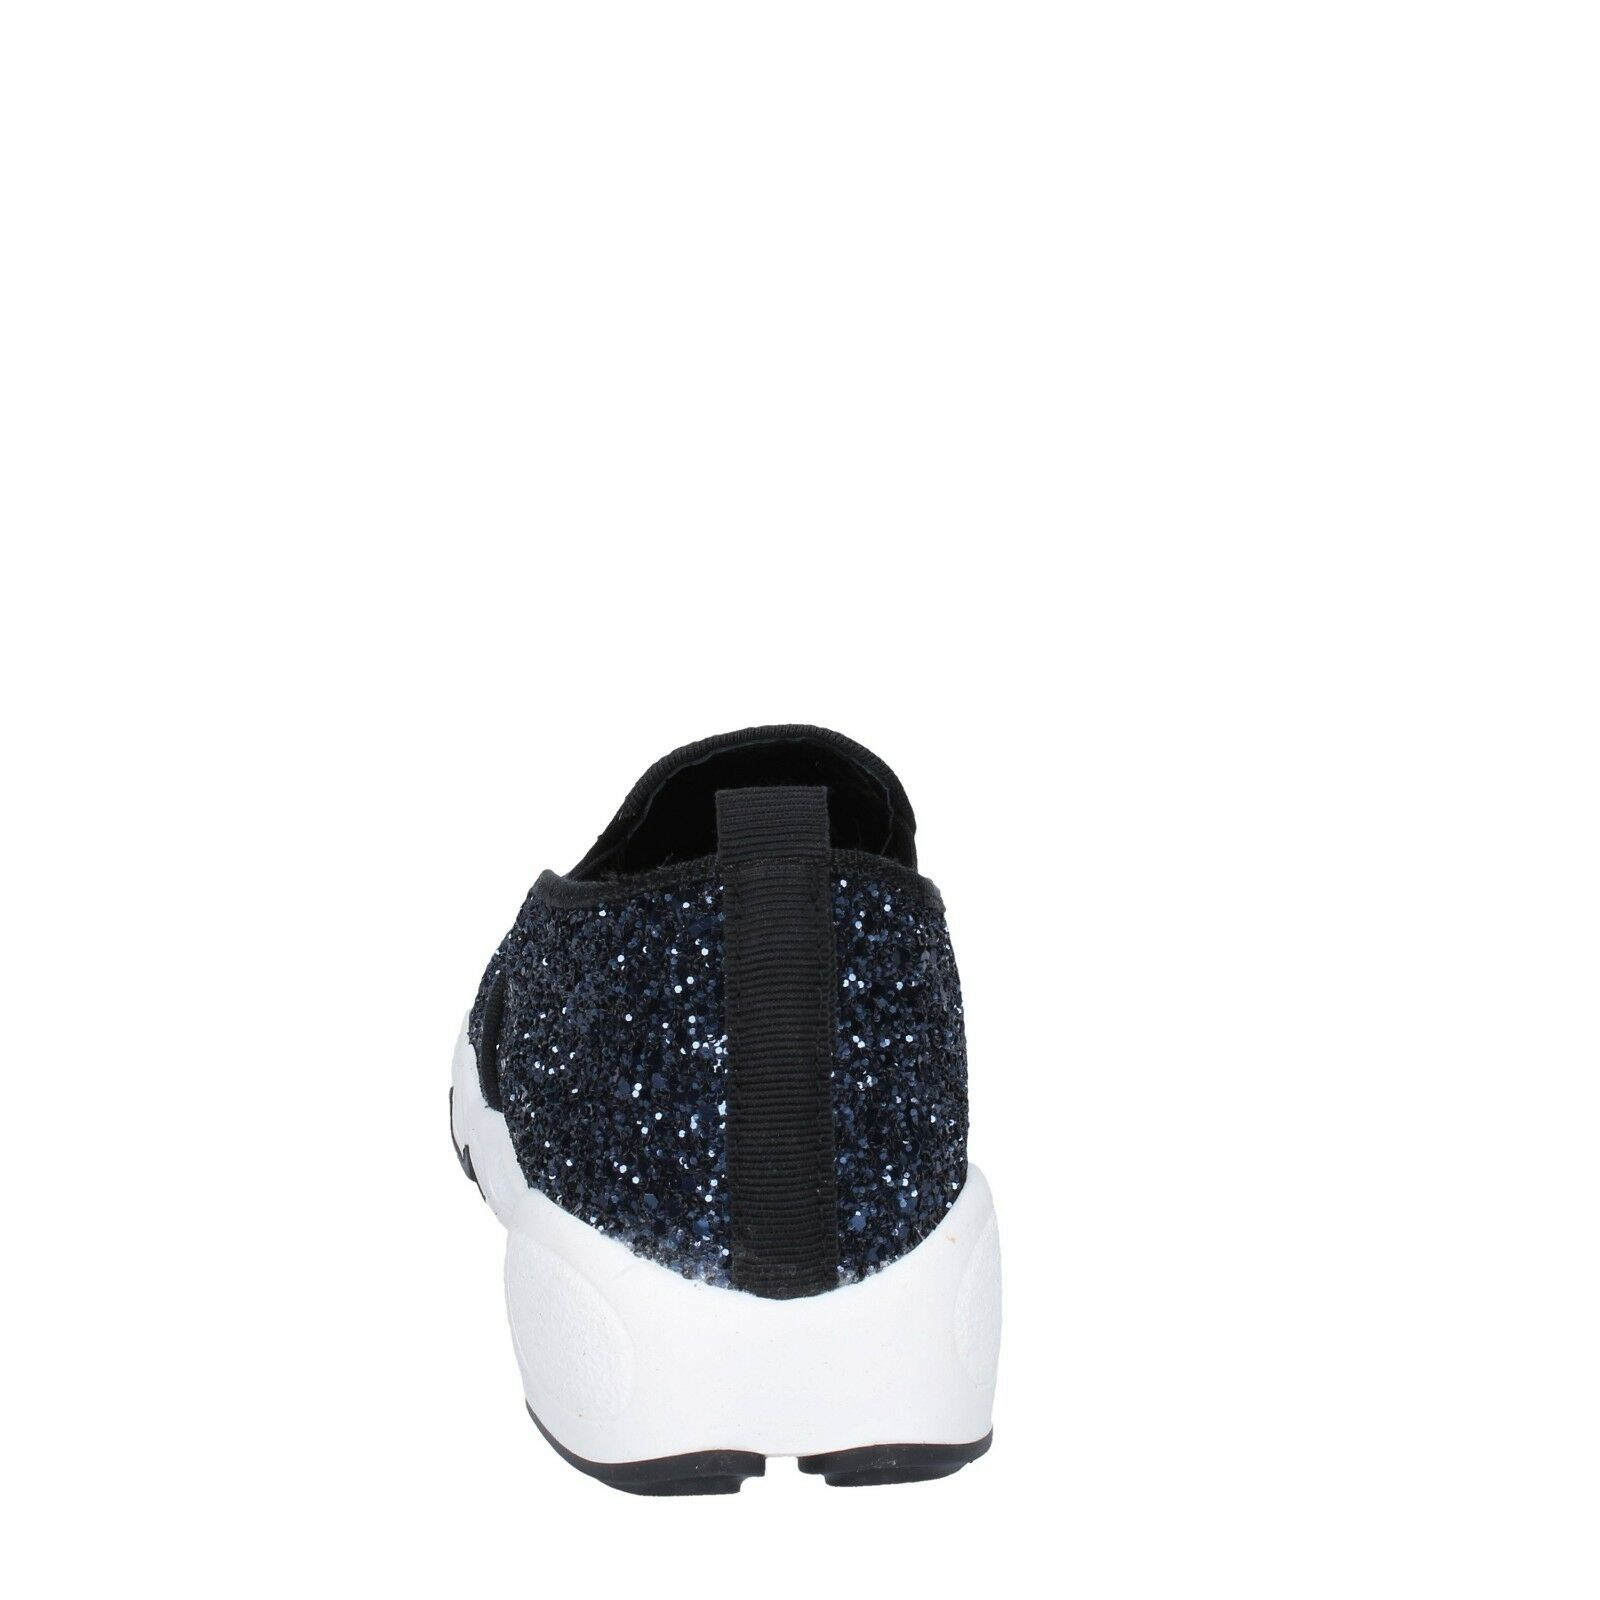 Scarpe 3 Donna Olga RUBINI 3 Scarpe (EU 36) Mocassini Da Infilare Blu Glitter BX790-36 513c25